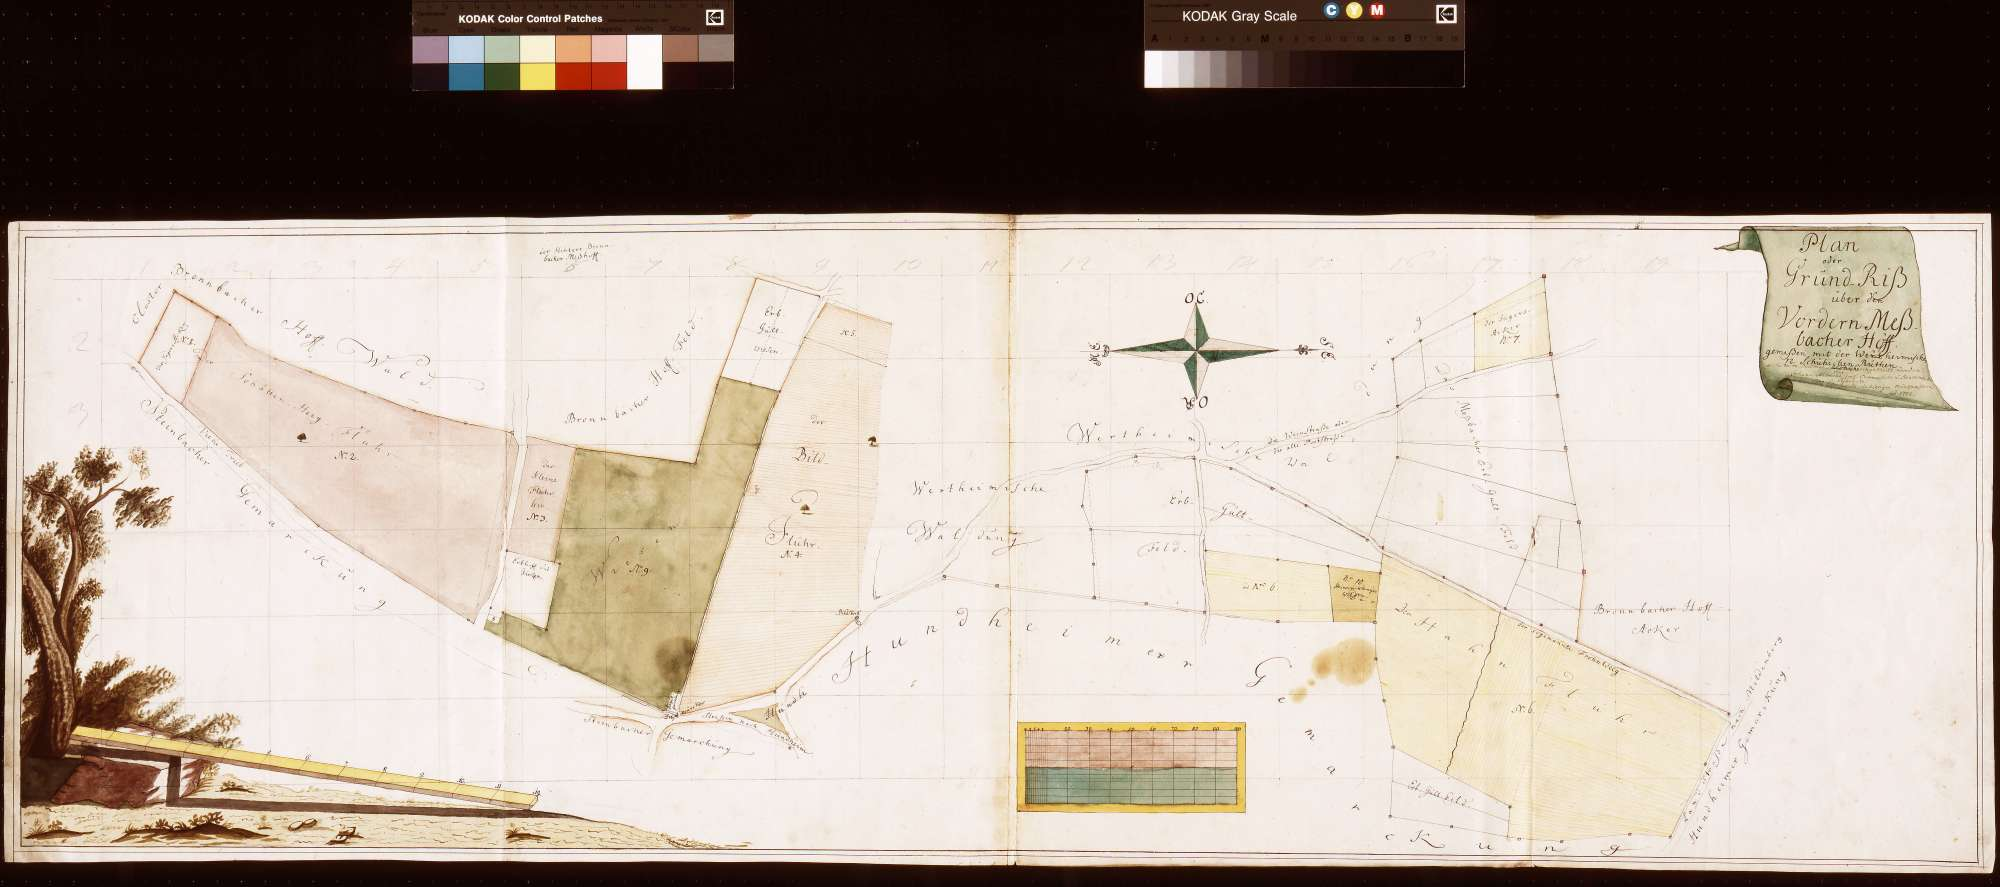 Grundriss über den Vorderen Meßhof (Meßbacher Hof) (Inselkarte), Bild 1